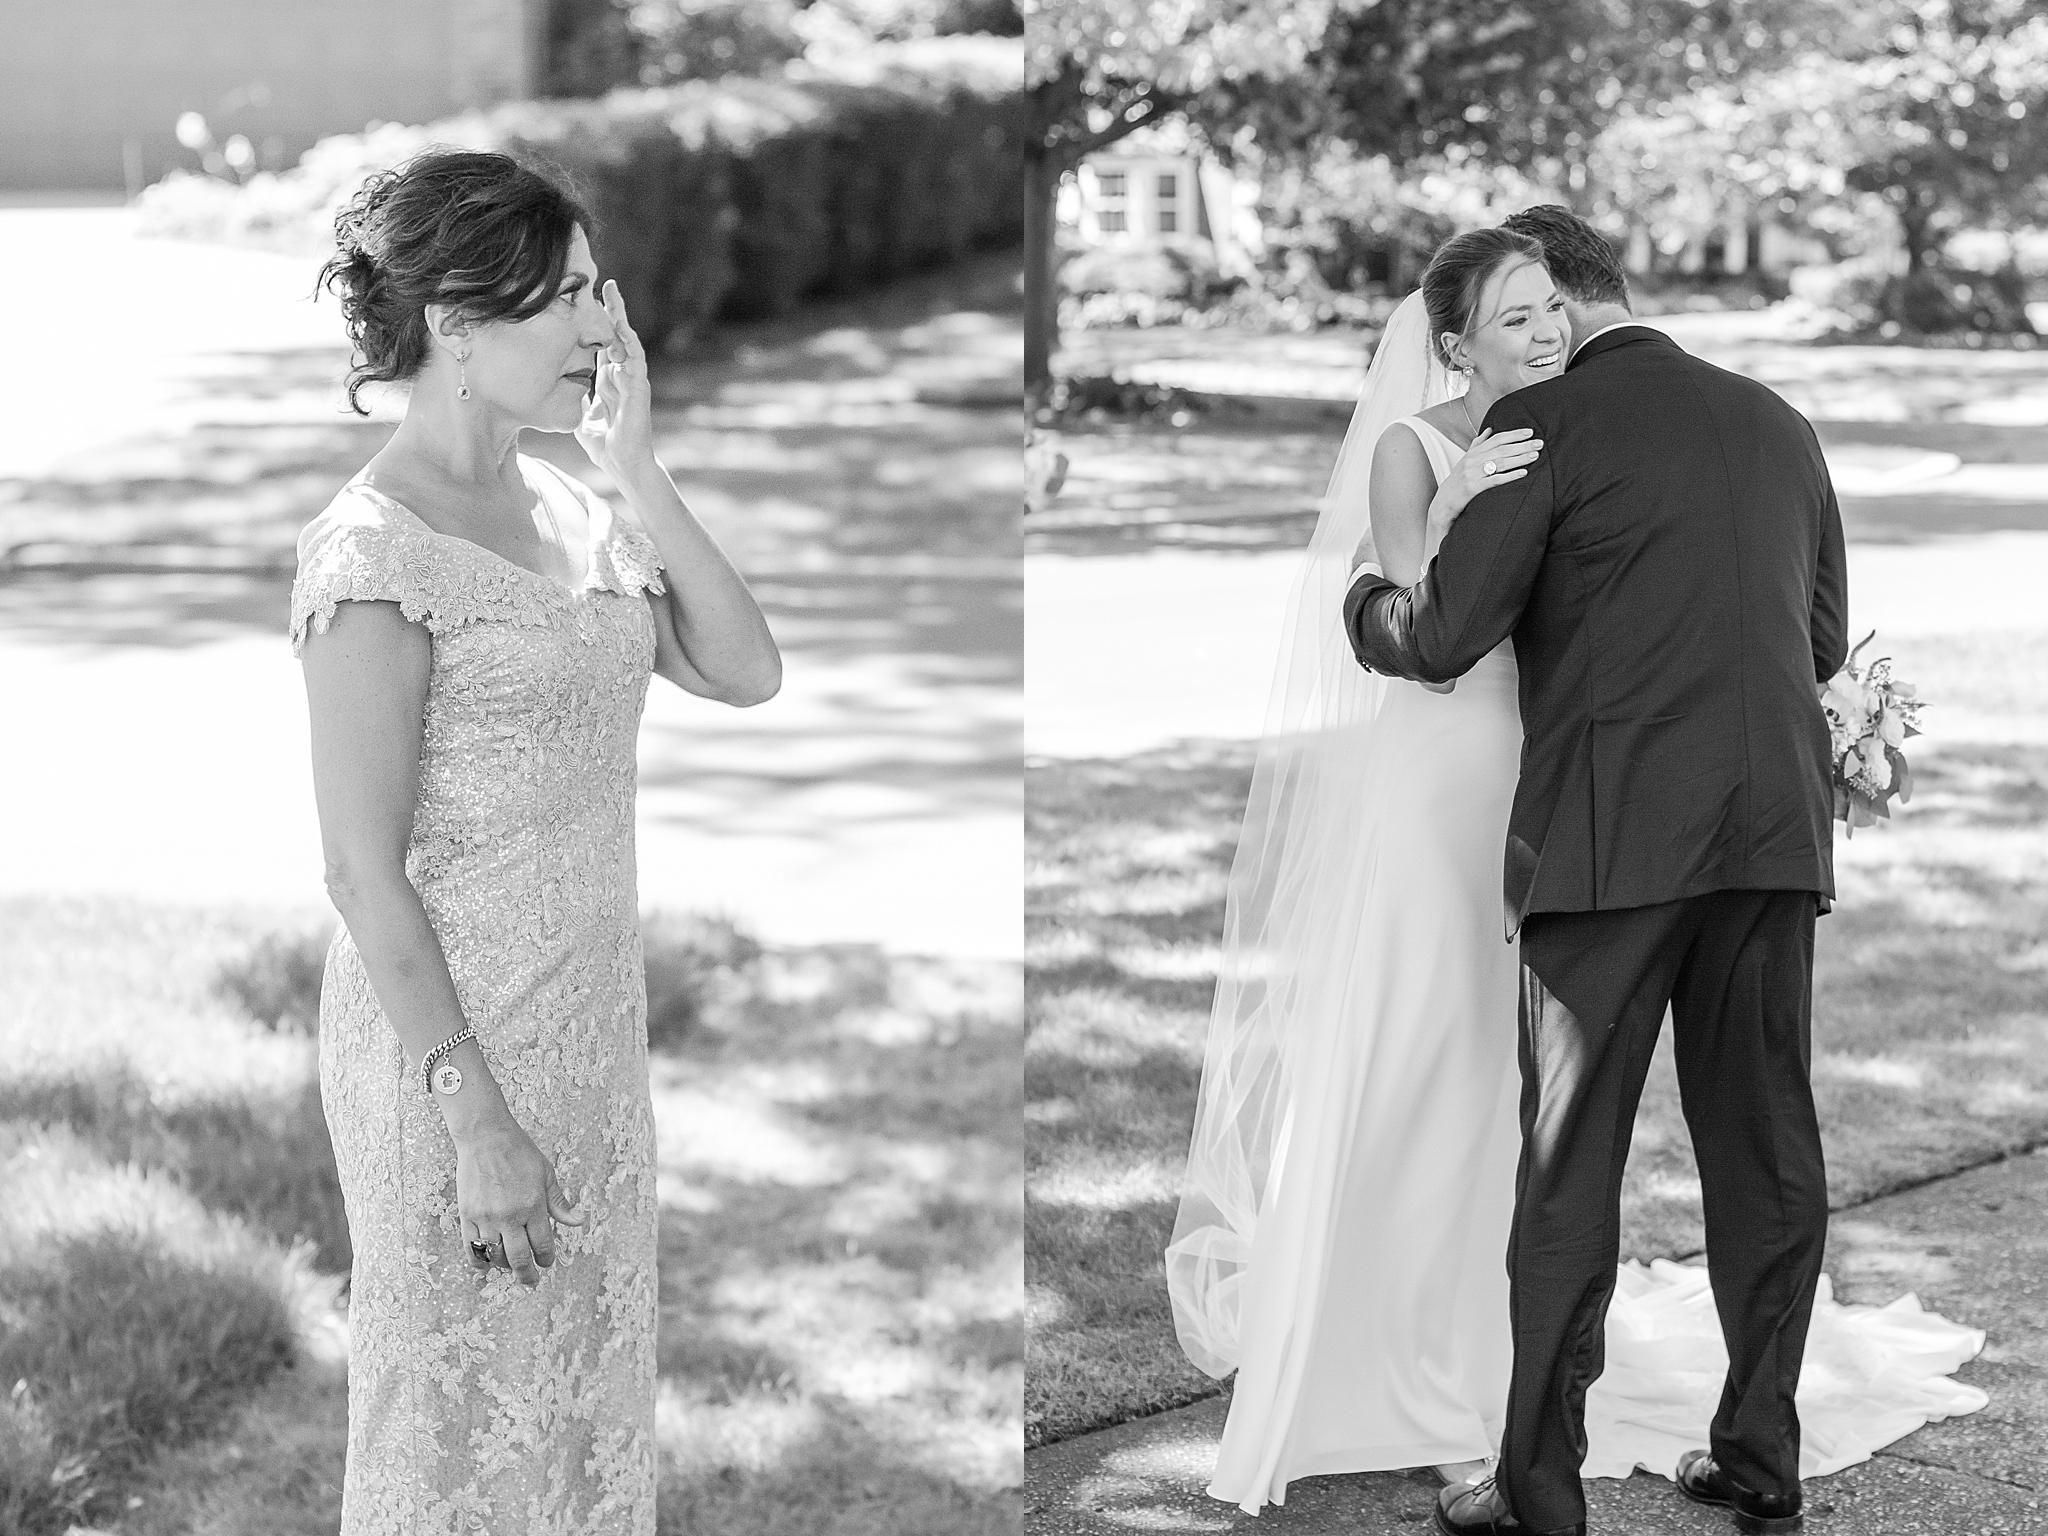 detroit-wedding-photographer-grosse-pointe-academy-chapel-detroit-golf-club-wedding-carly-matt-by-courtney-carolyn-photography_0024.jpg